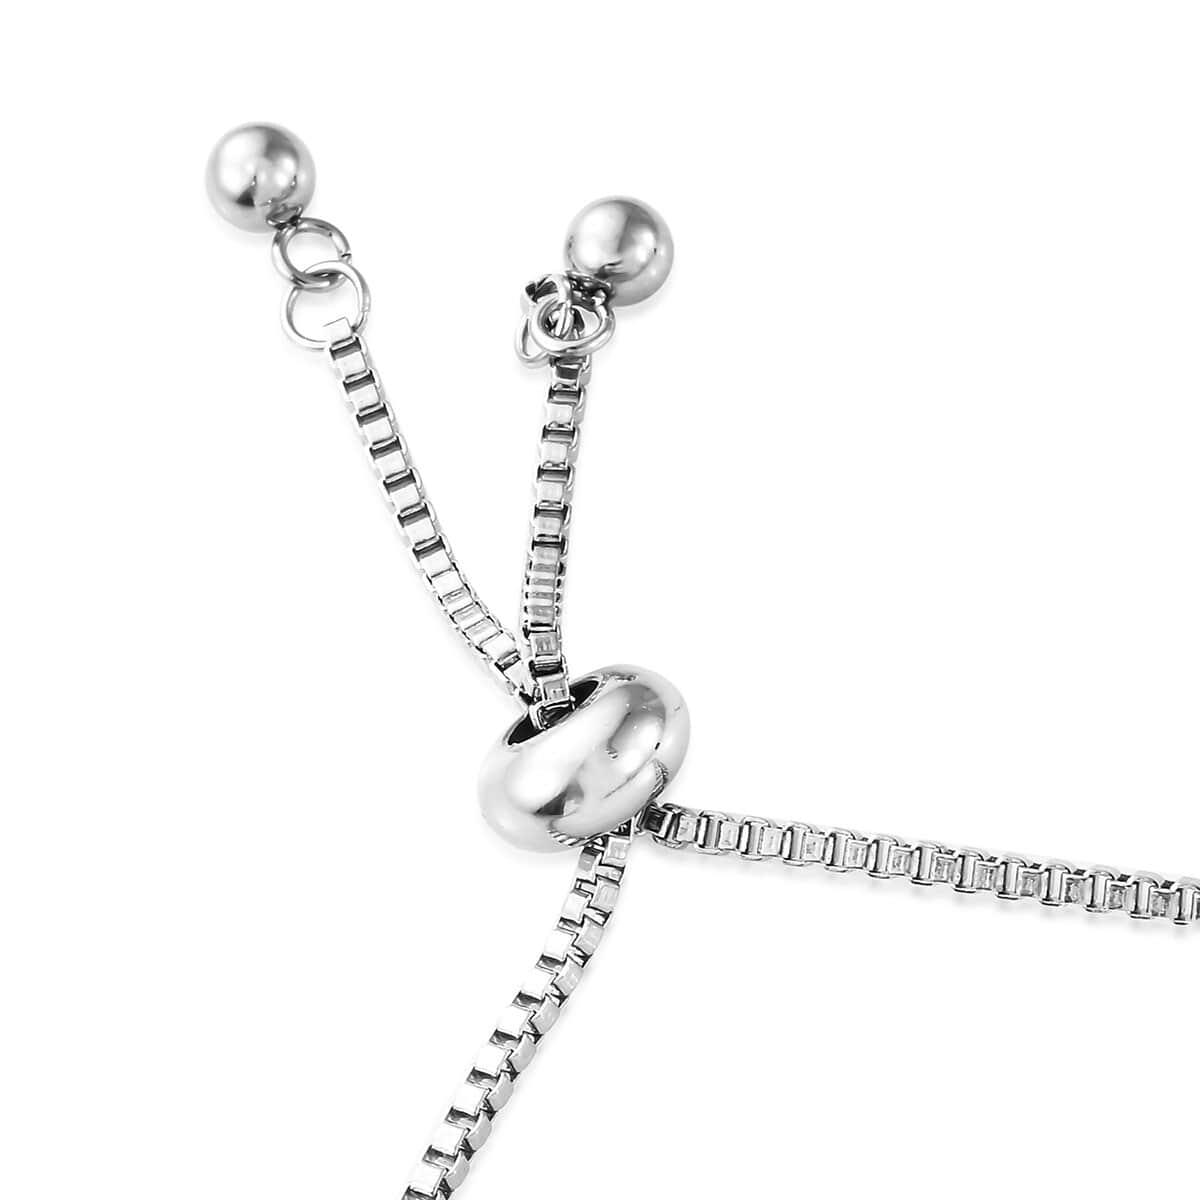 Steel-Cubic-Zirconia-CZ-Orange-Elegant-Adjustable-Bolo-Bracelet-for-Women-Ct-21 thumbnail 32